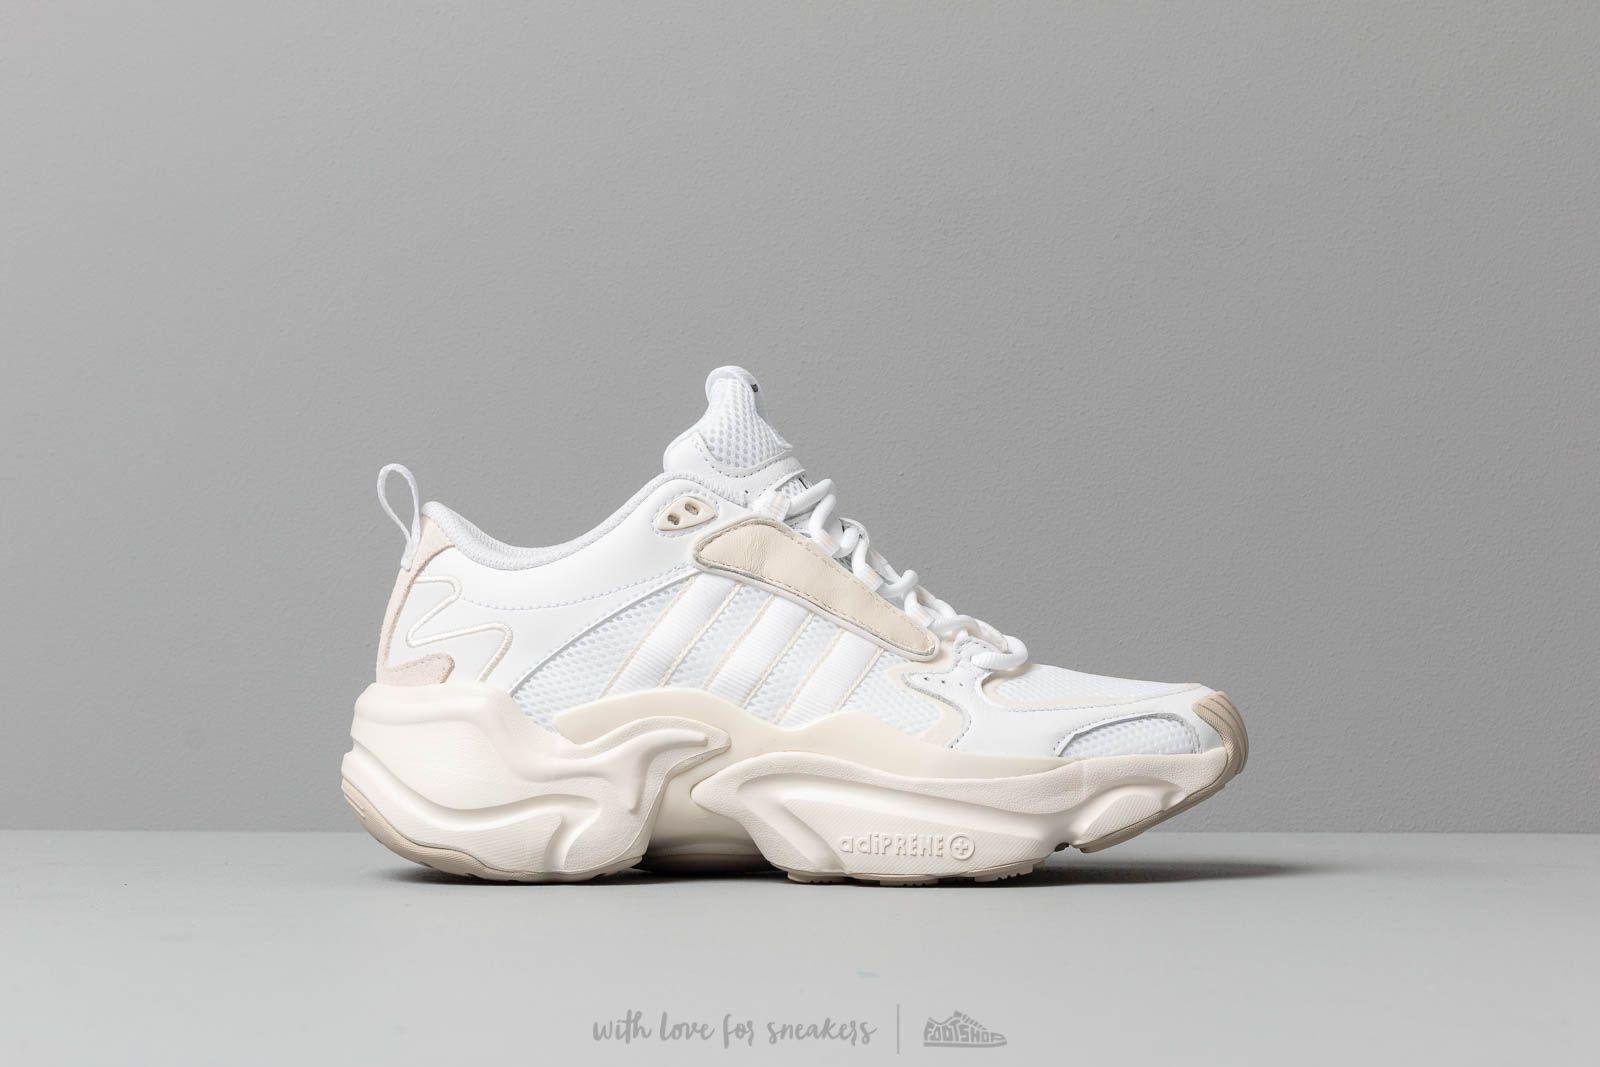 43b32e92cd6ac adidas Consortium x Naked Magmur Runner Ftwr White  Chalk White  Off White  at a